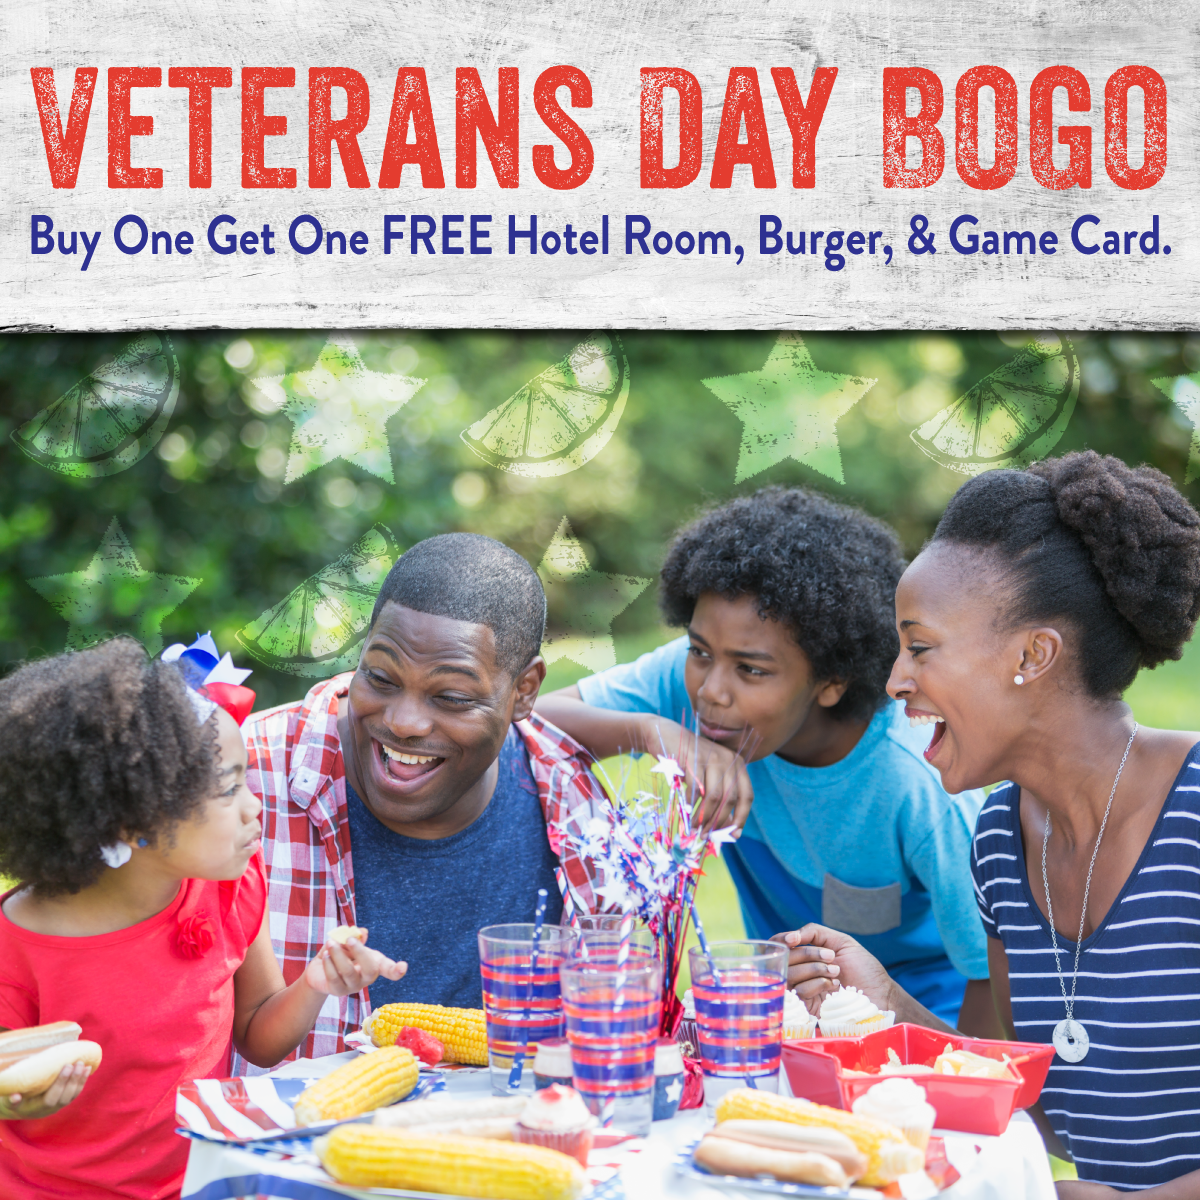 Veteran's Day Buy One Get One